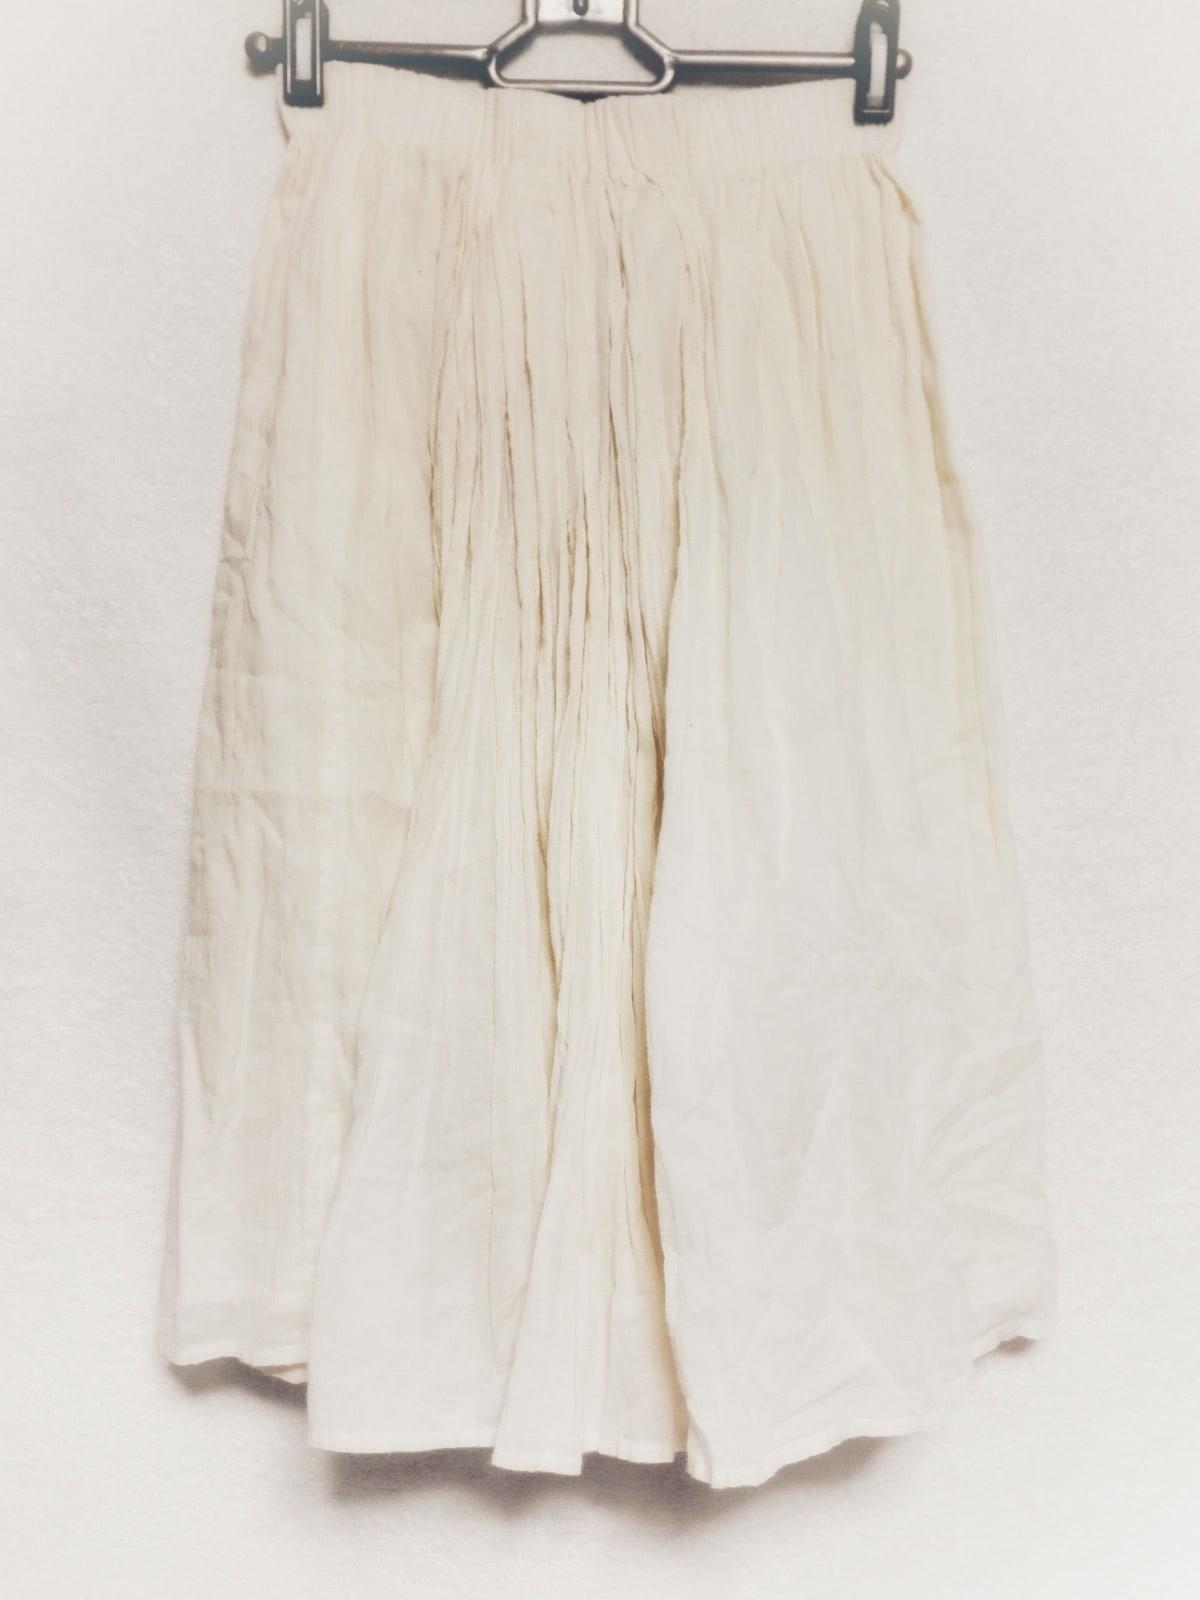 elsa esturgie(エルザエストロジー)のスカート